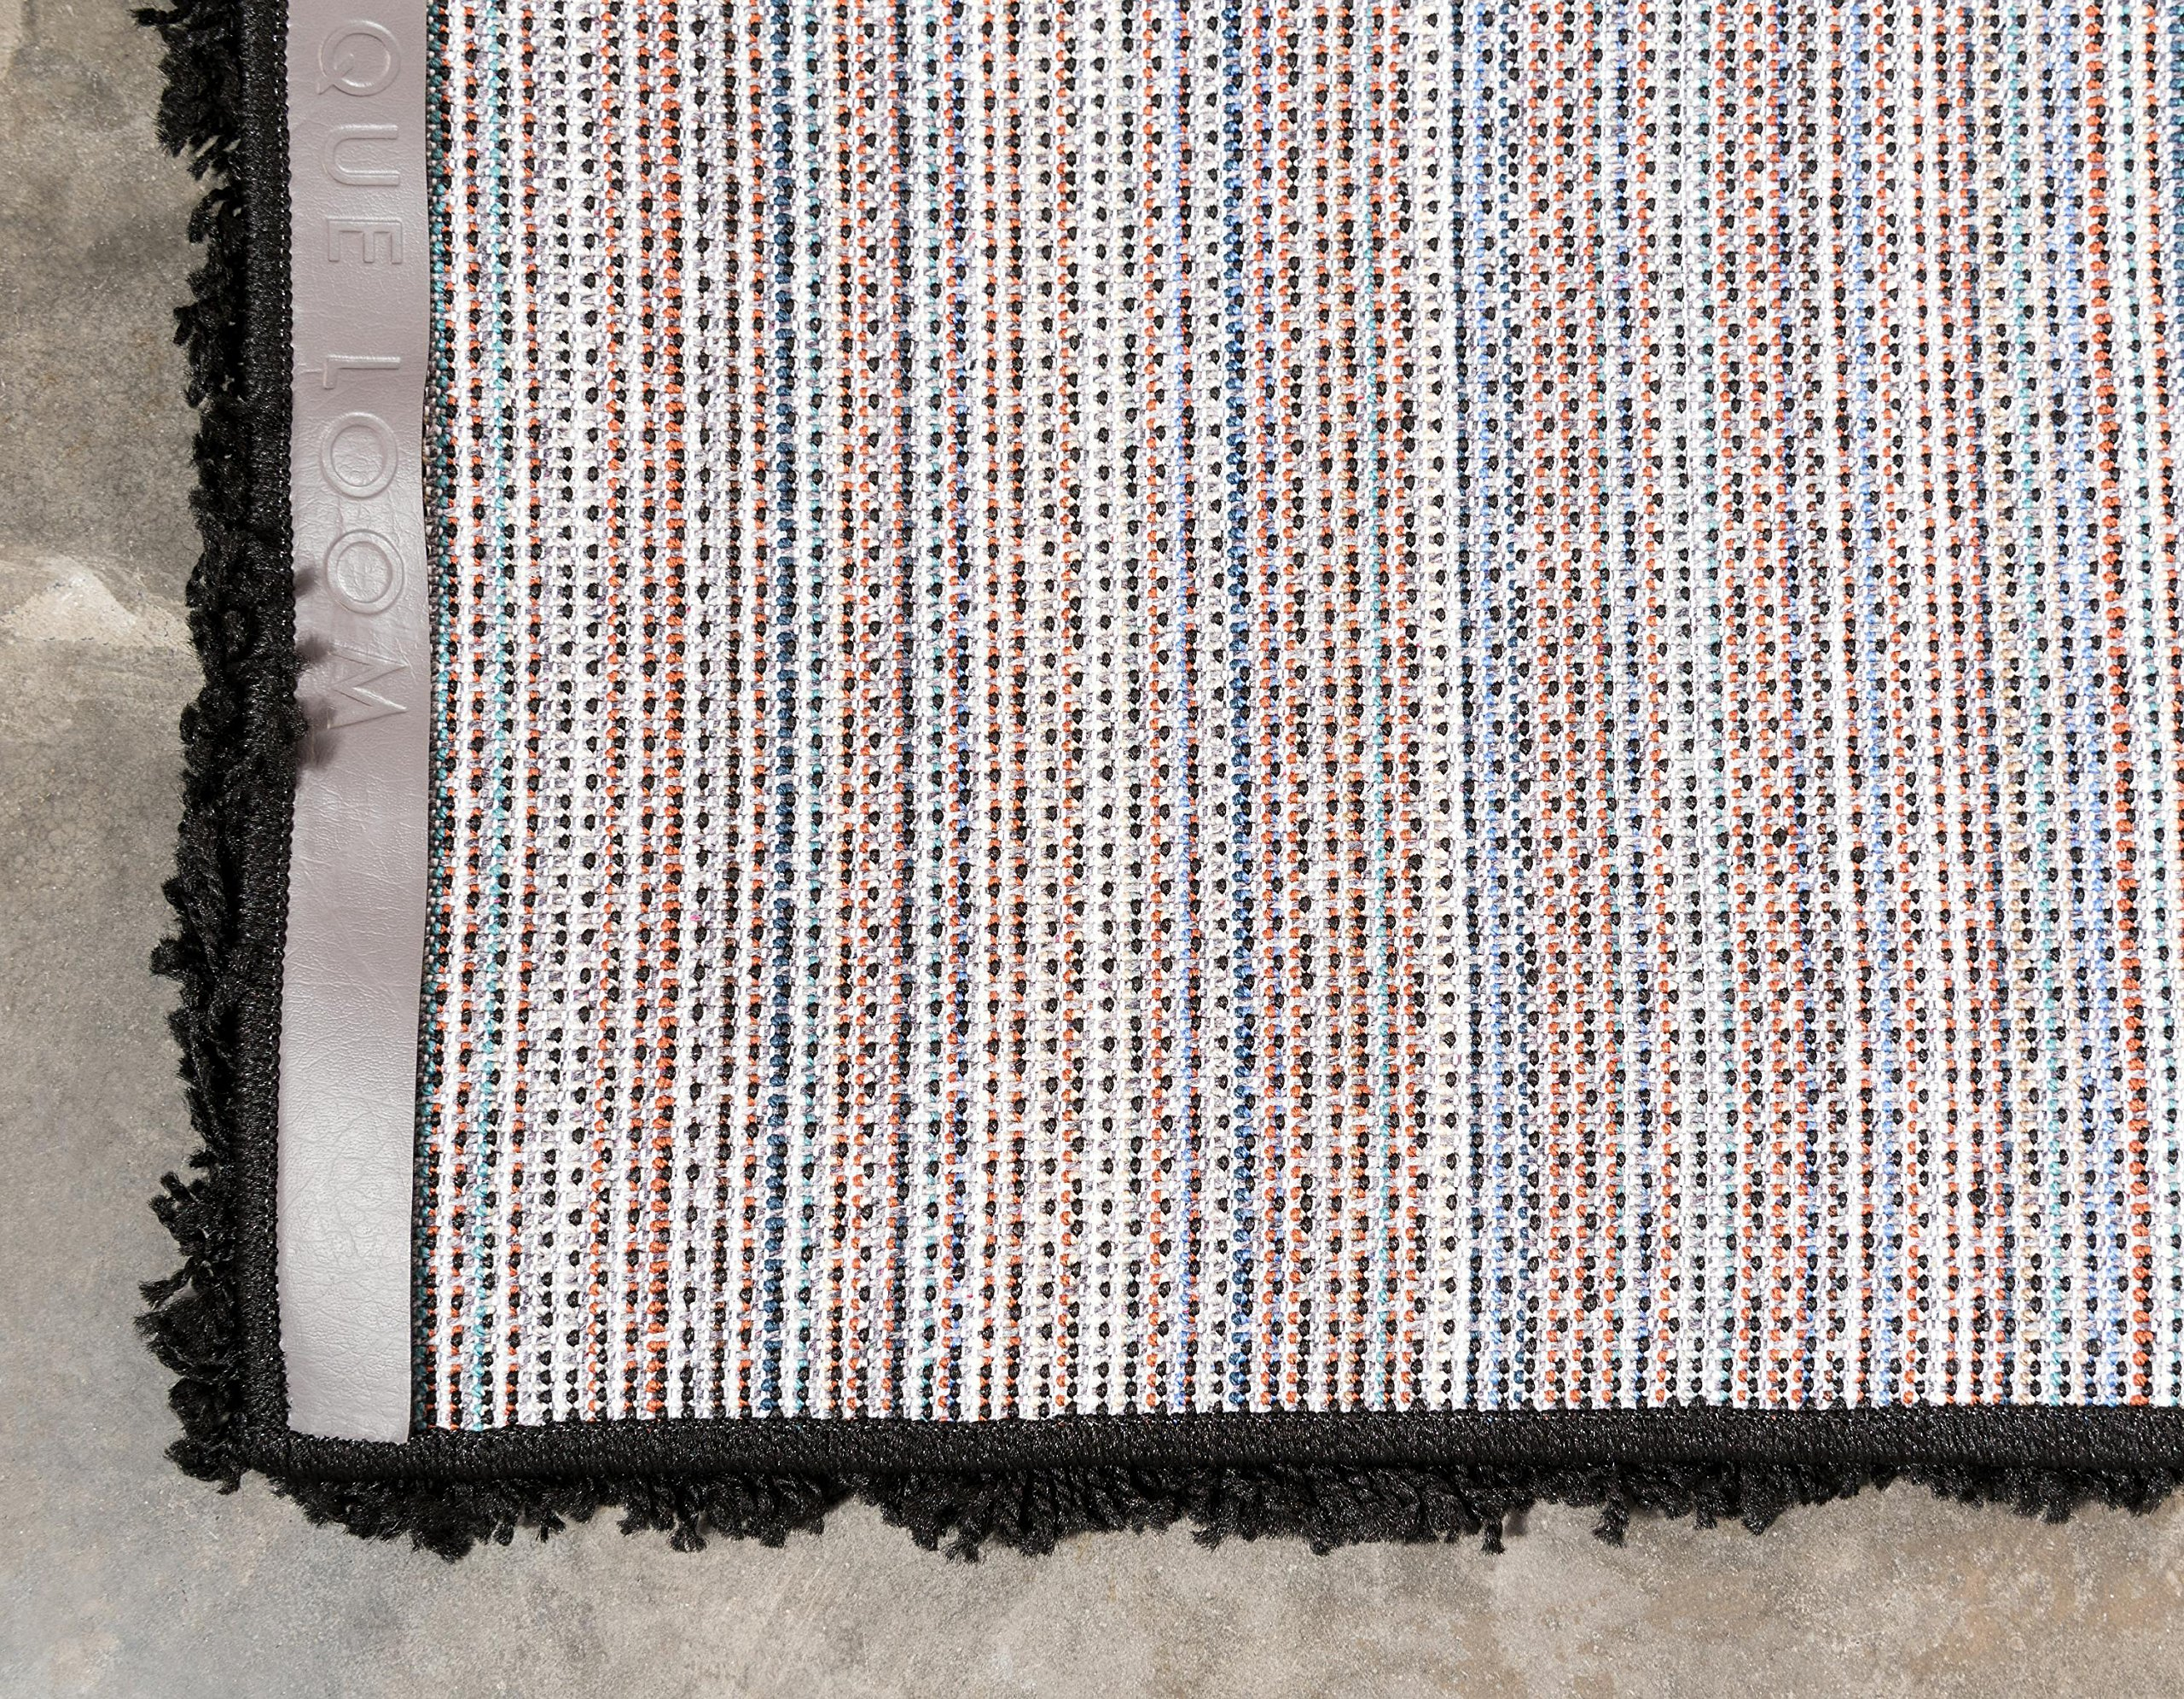 Unique Loom Solo Solid Shag Collection Modern Plush Jet Black Rectangle (5' x 8') by Unique Loom (Image #10)